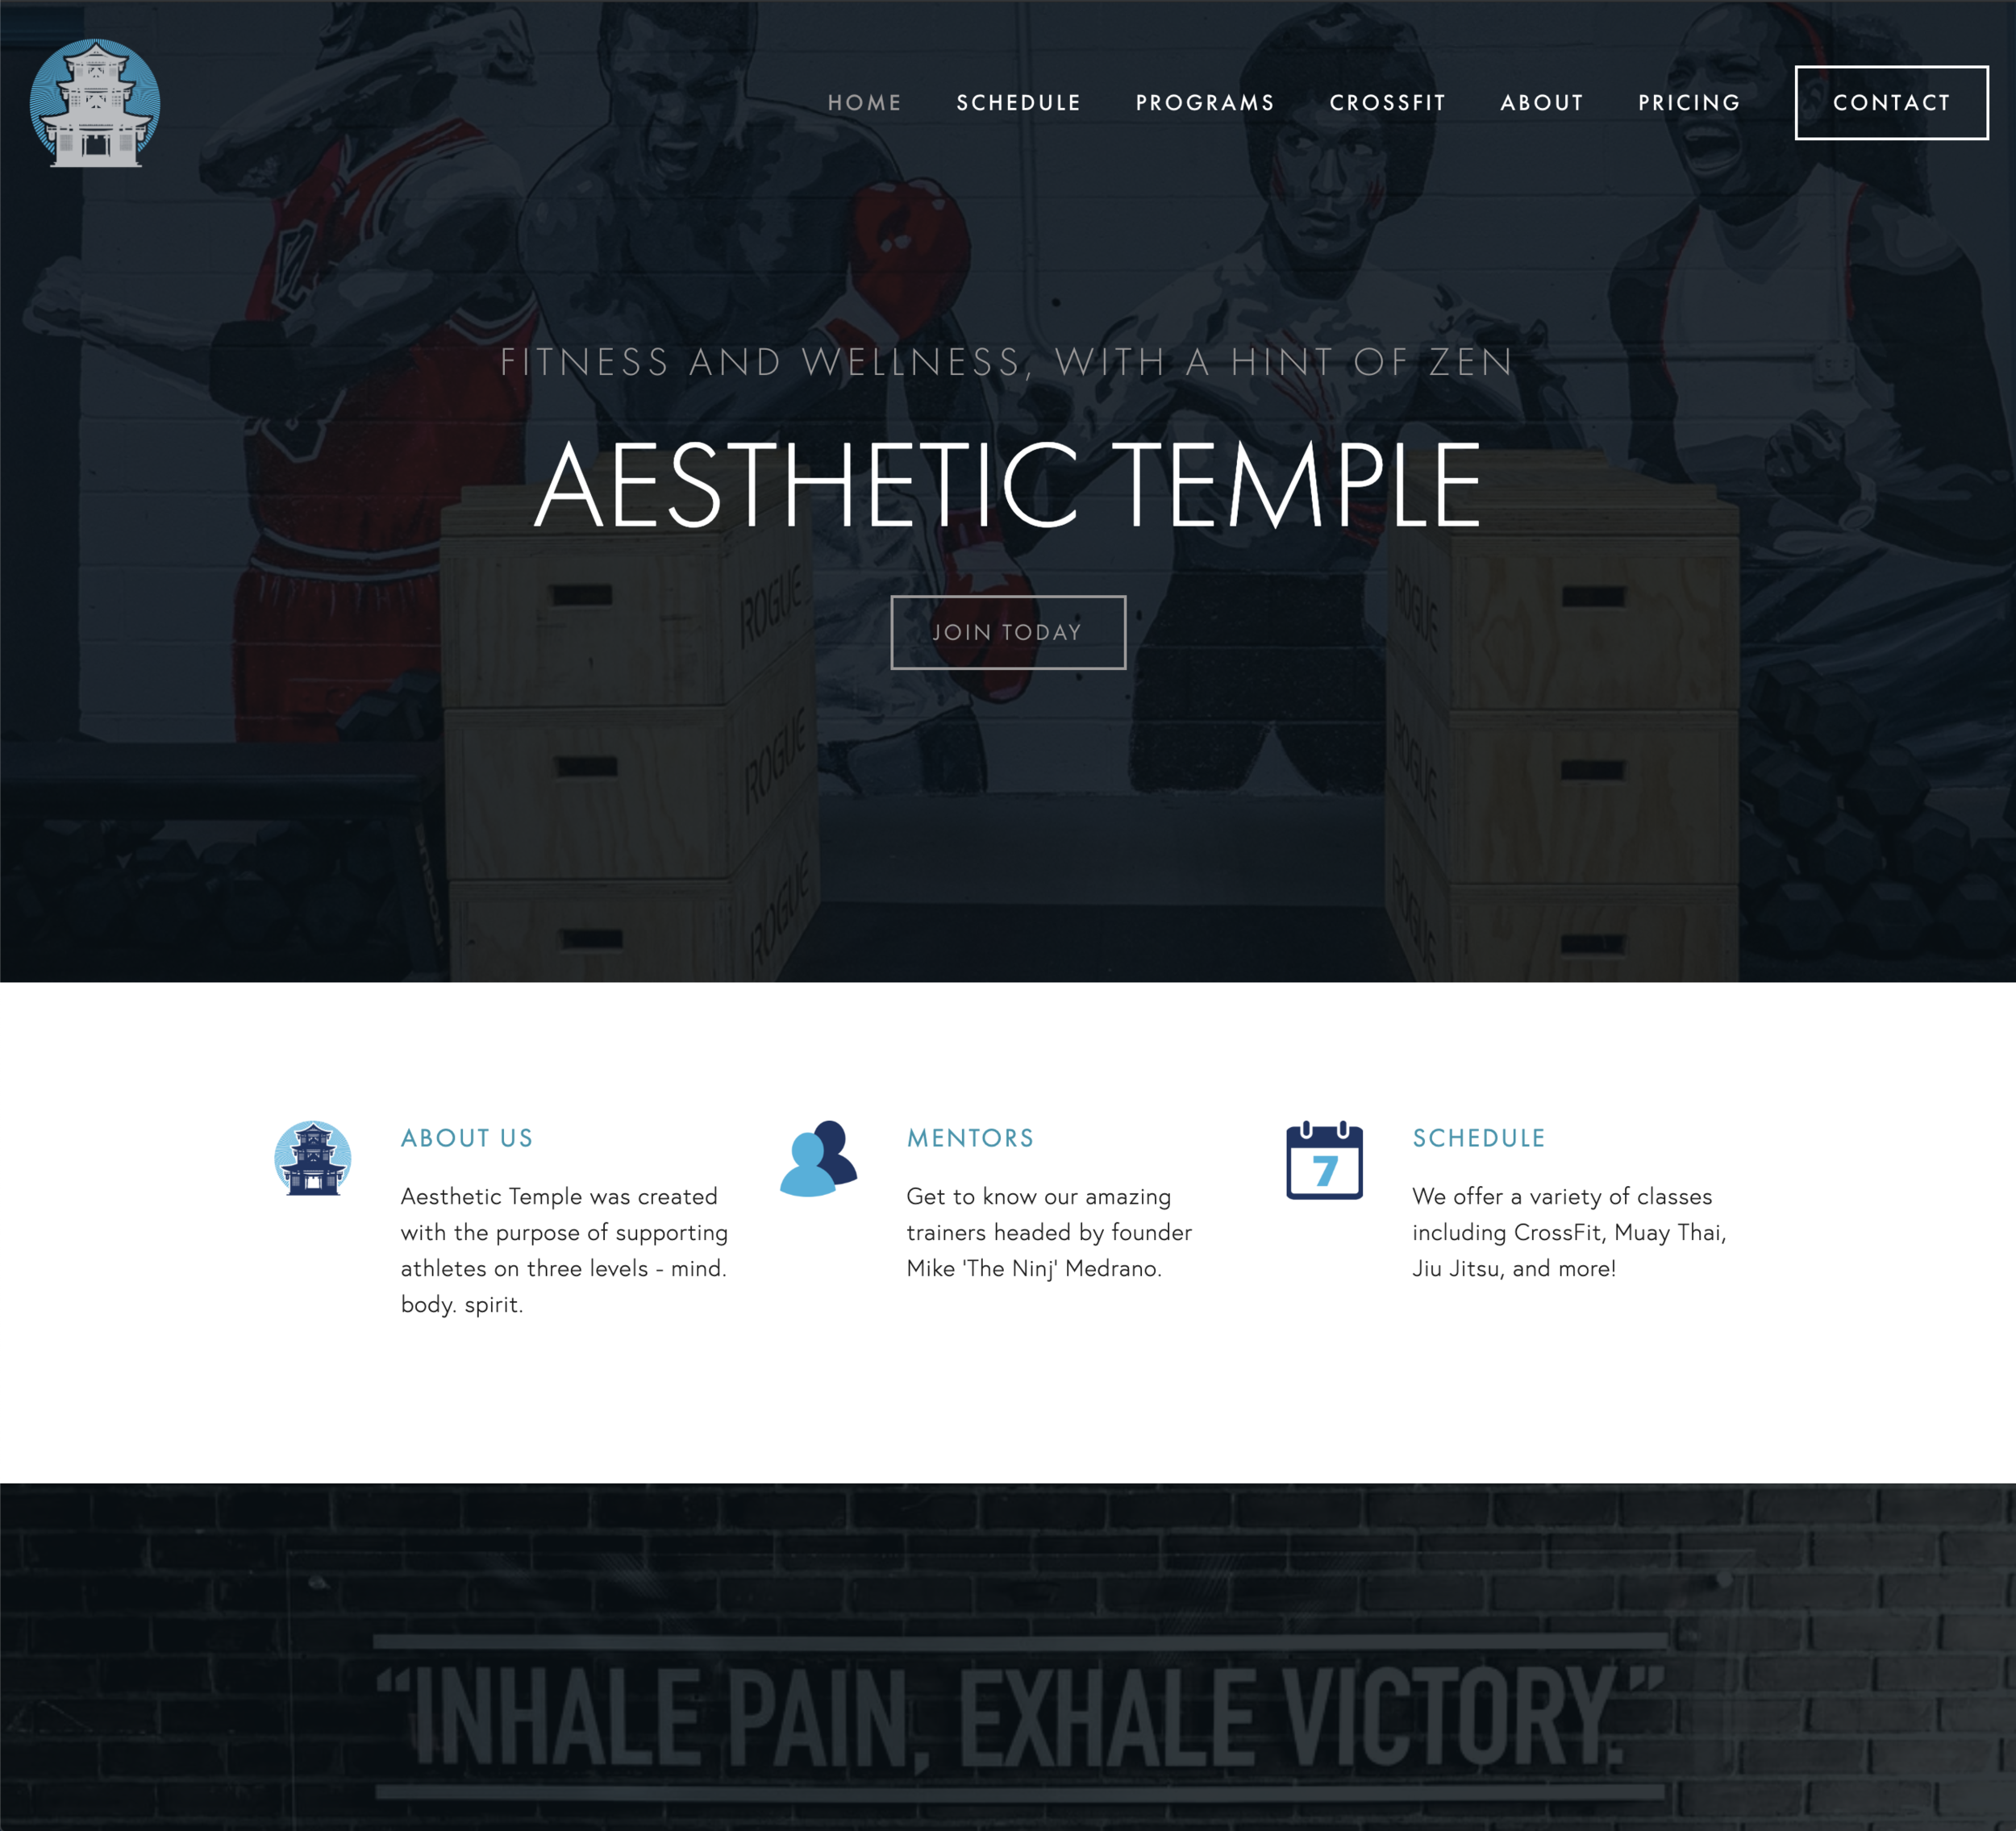 Aesthetic Temple Website